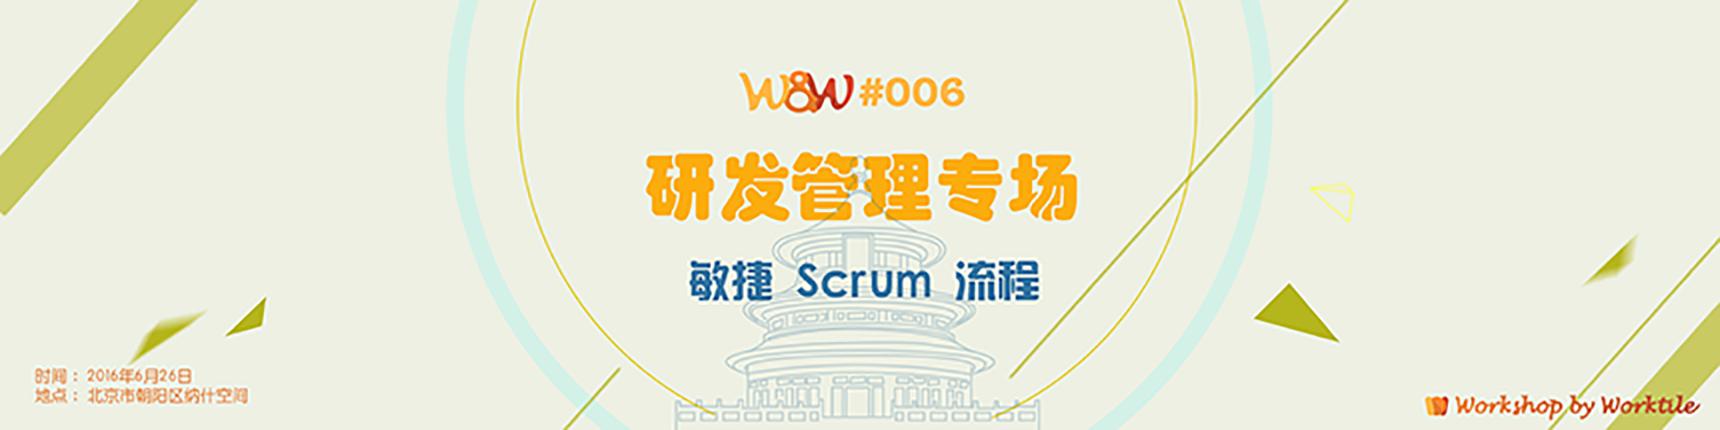 W&Workshop No. 6 研发管理转场 敏捷 Scrum 流程